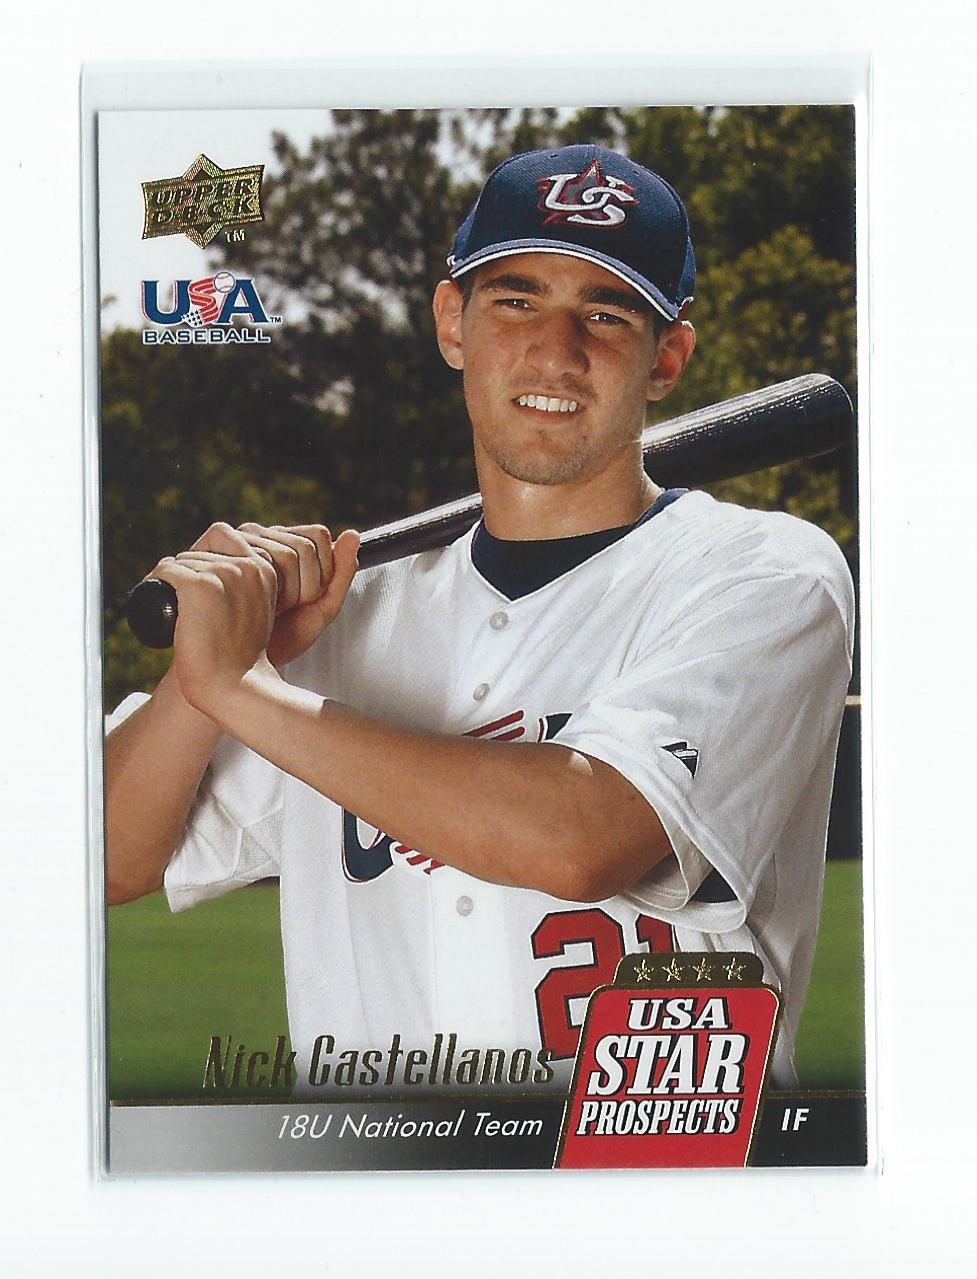 2009 Upper Deck Signature Stars USA Star Prospects #USA2 Nick Castellanos